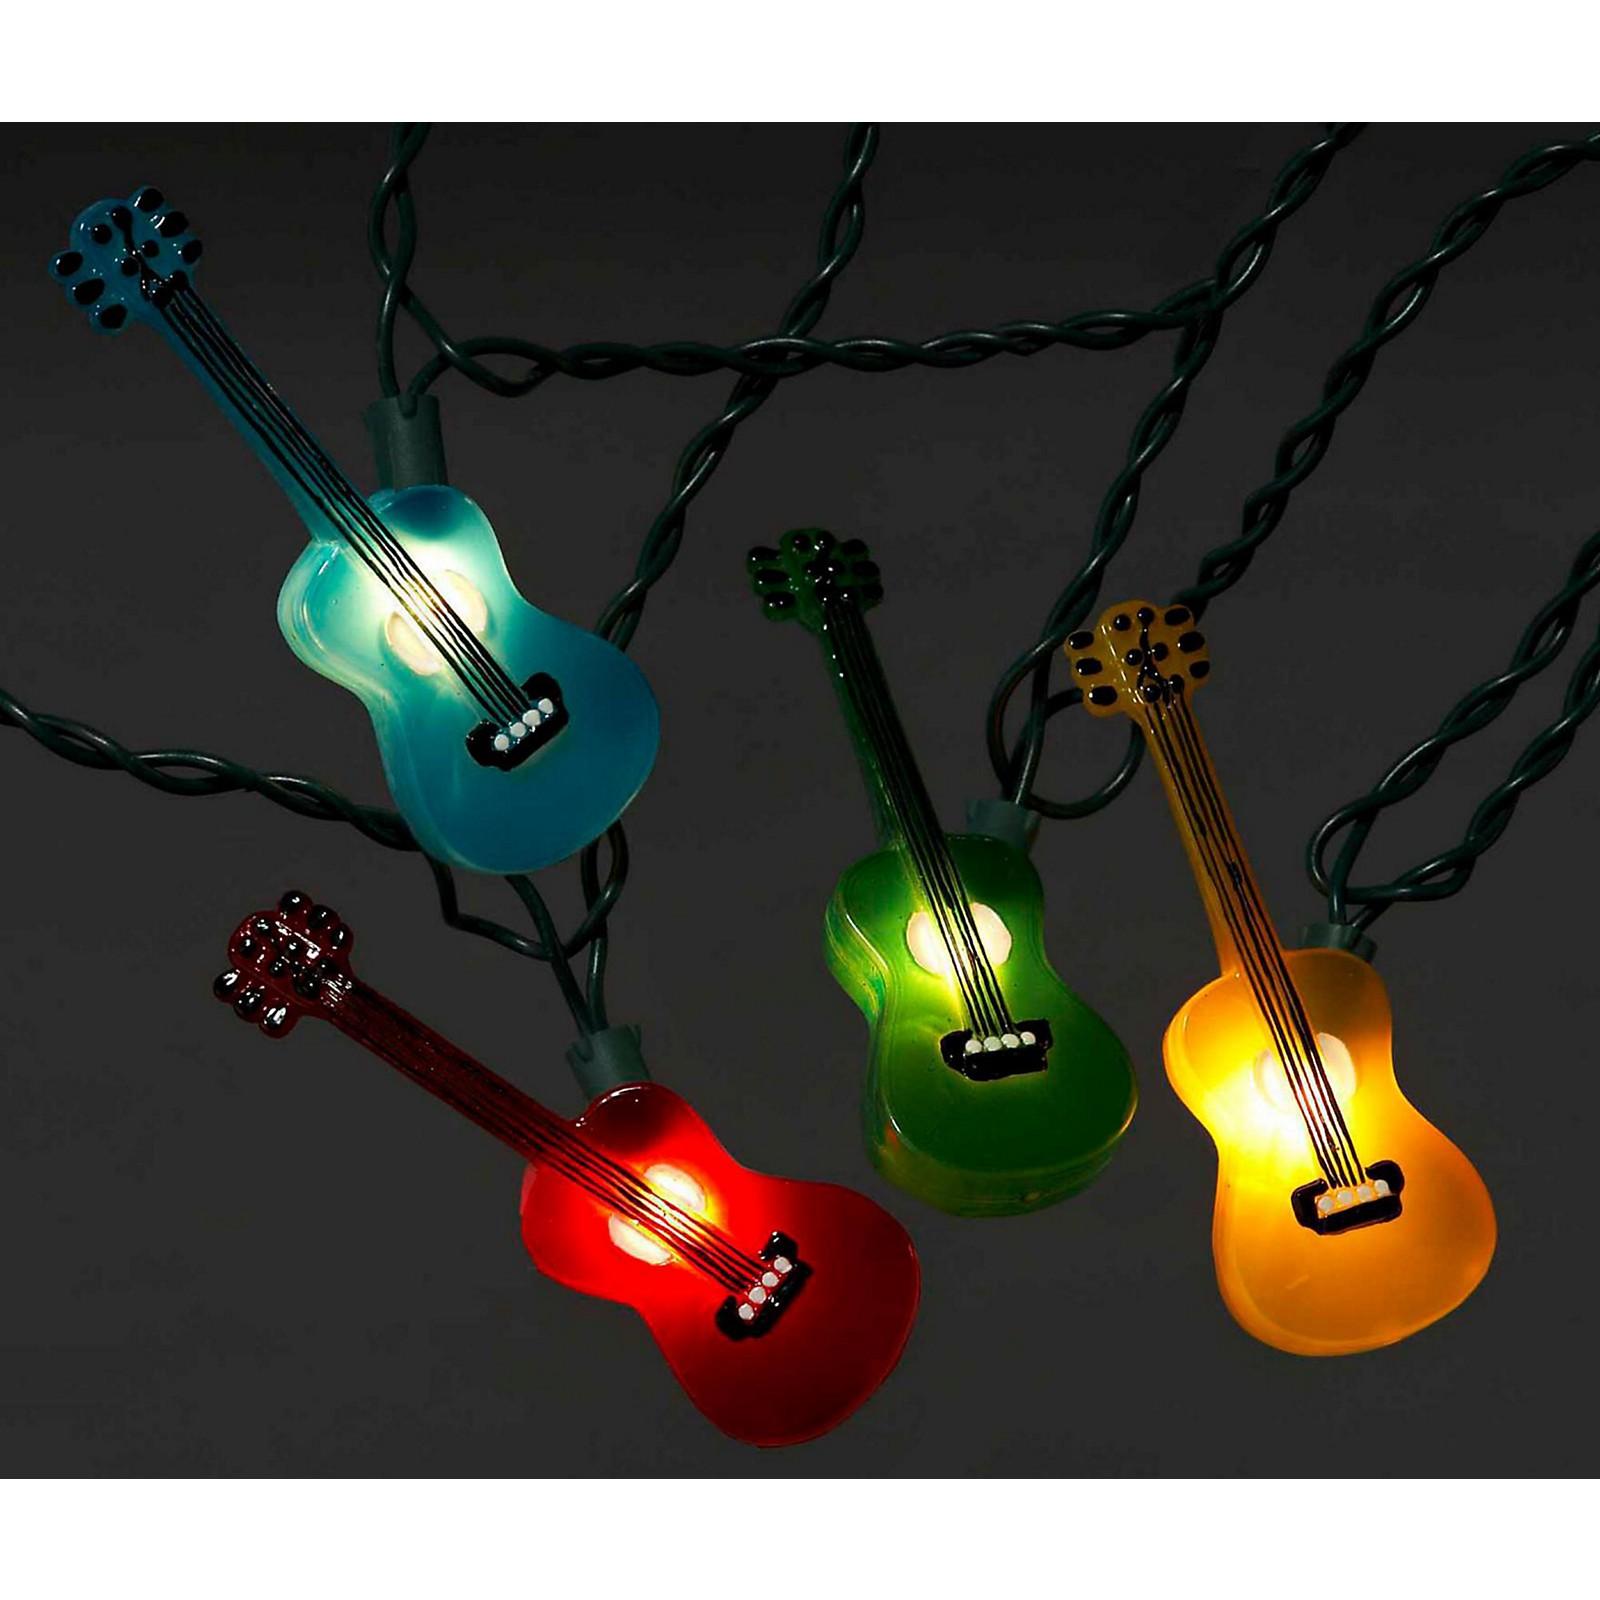 Kurt S. Adler Guitar Multi-Color Light Set 10 Lights